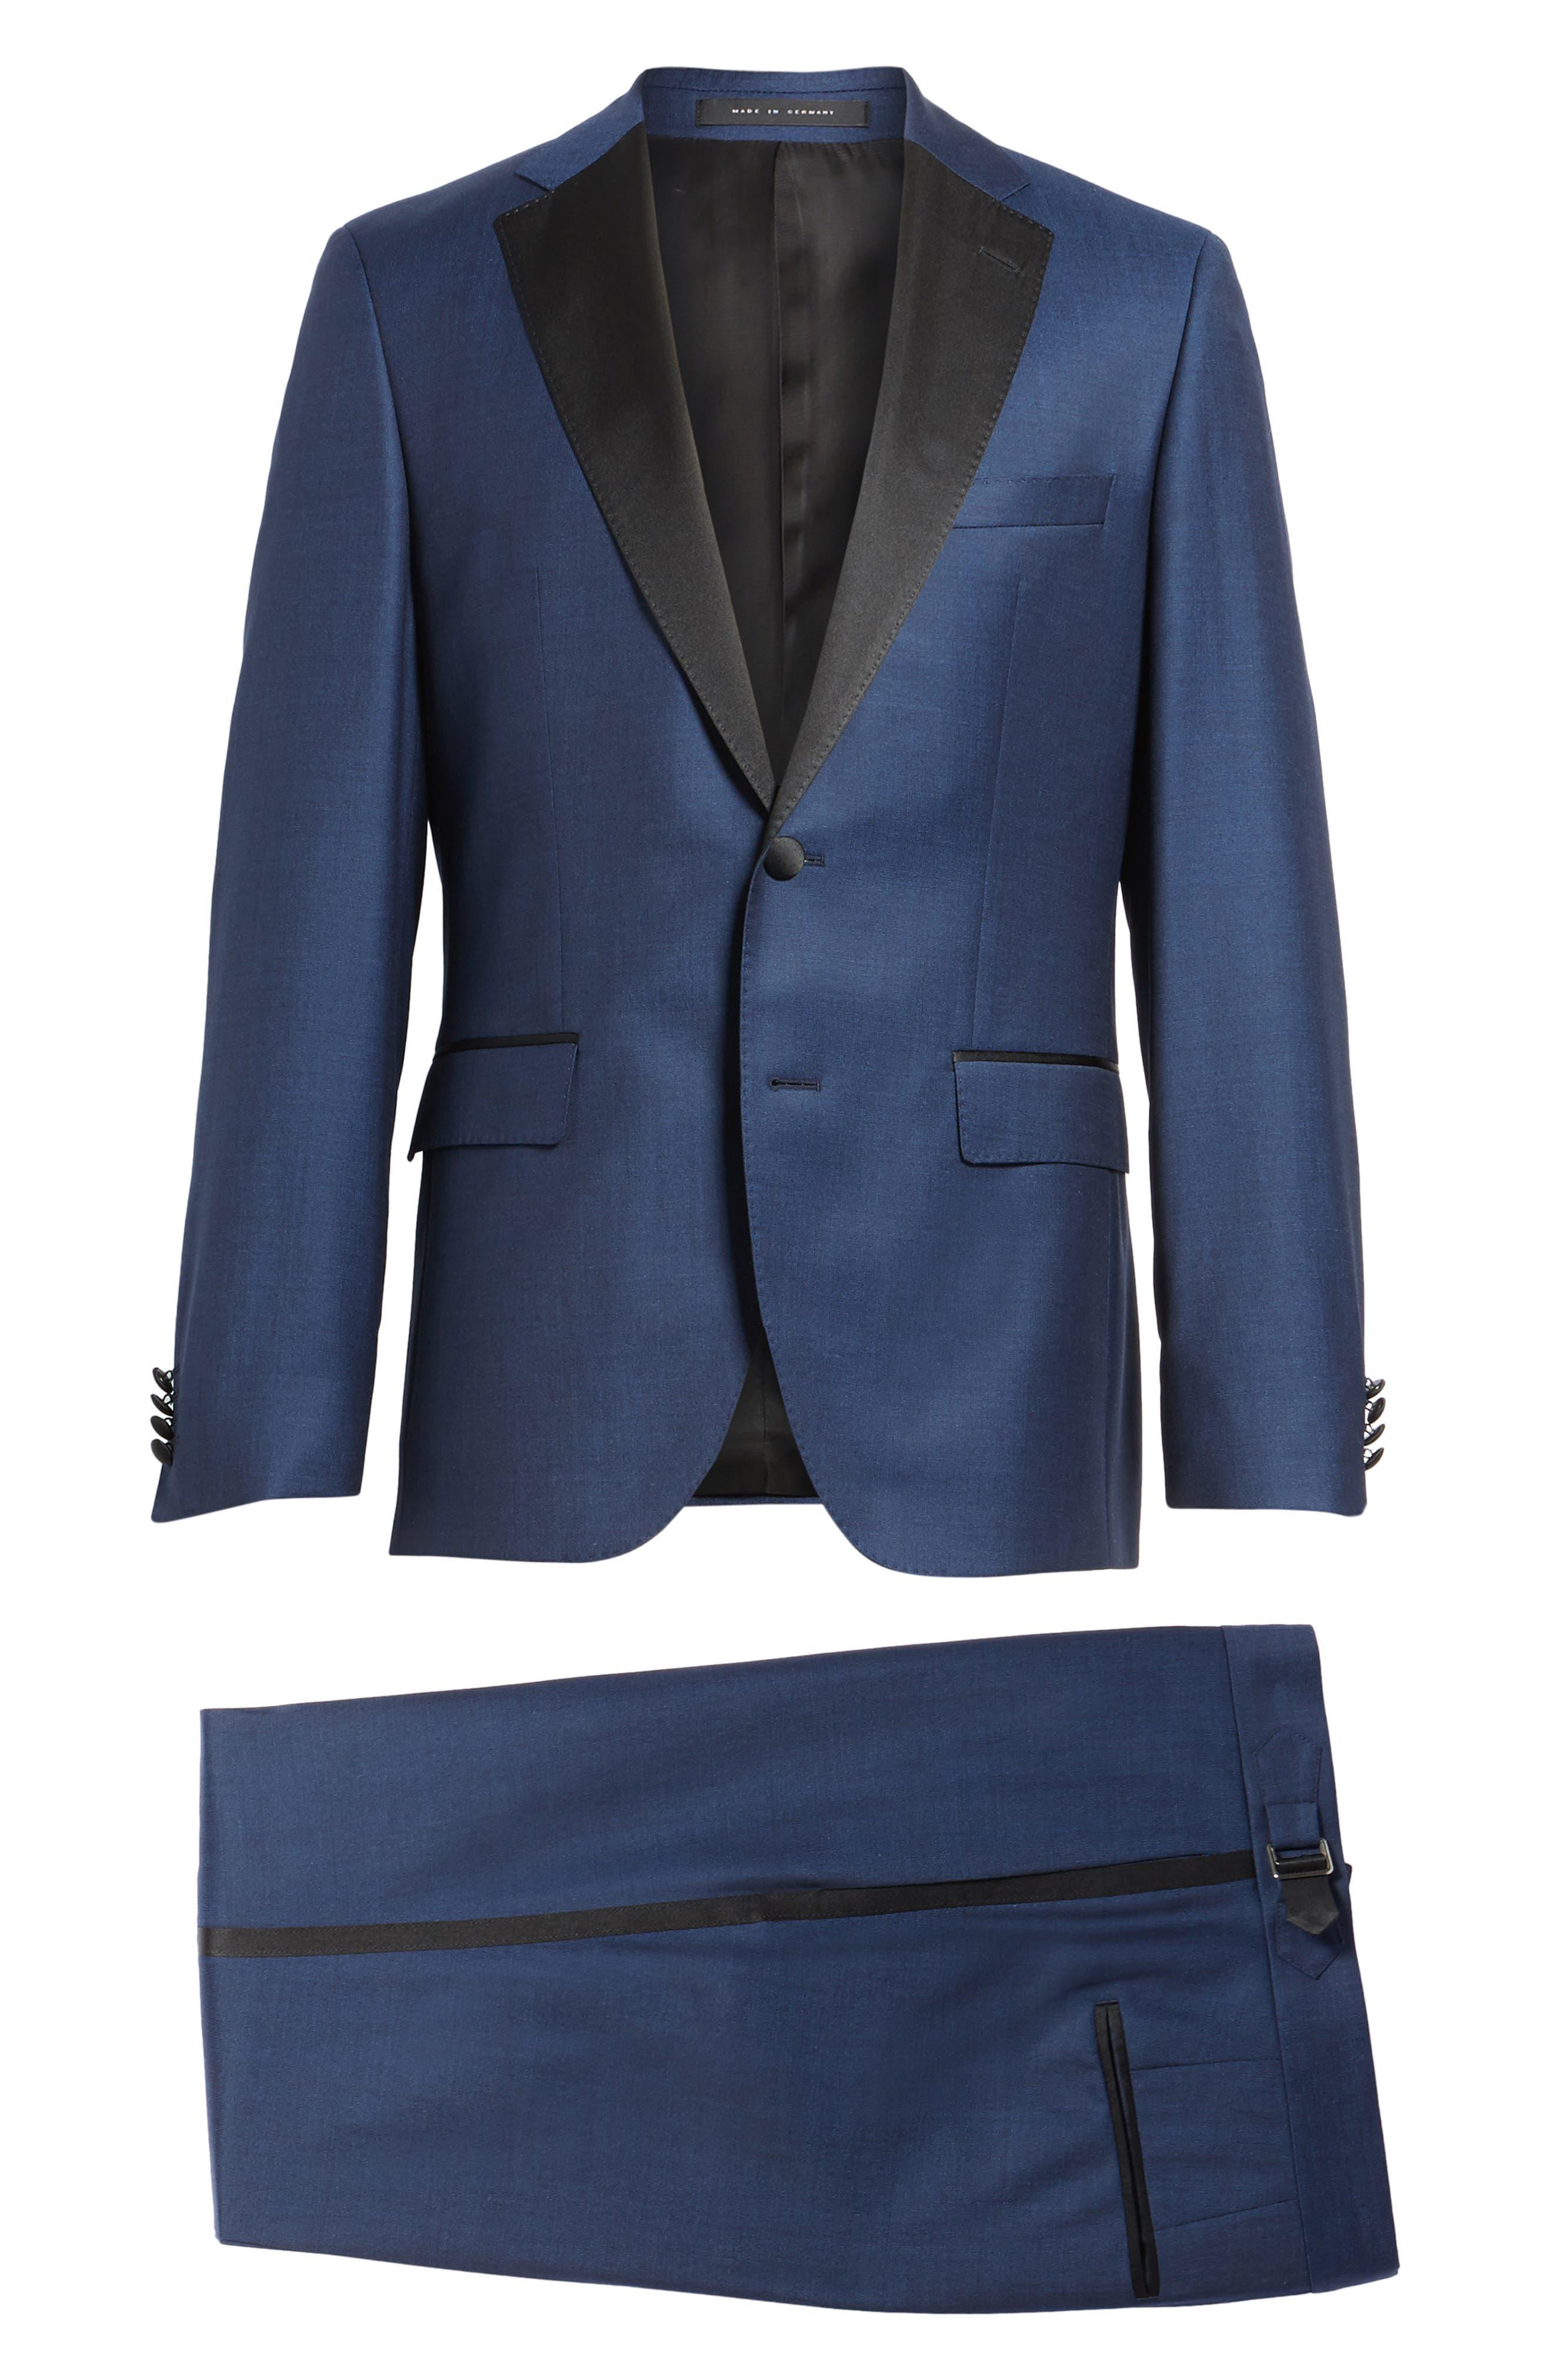 Jelvan/Livan Trim Fit Wool & Silk Tuxedo,                             Alternate thumbnail 8, color,                             Medium Blue